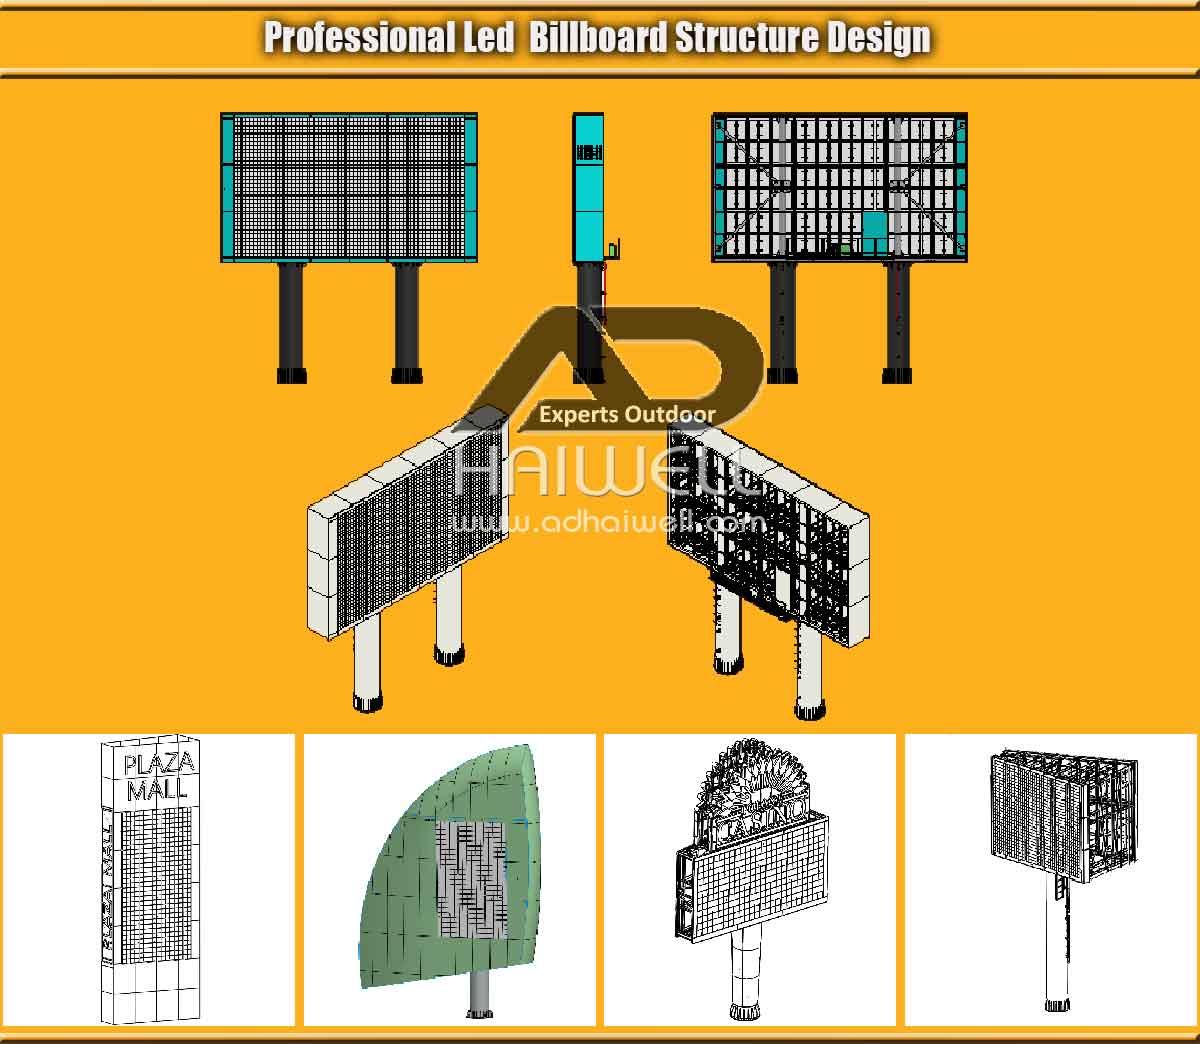 Professional-LED-Billboard-Structure-Design